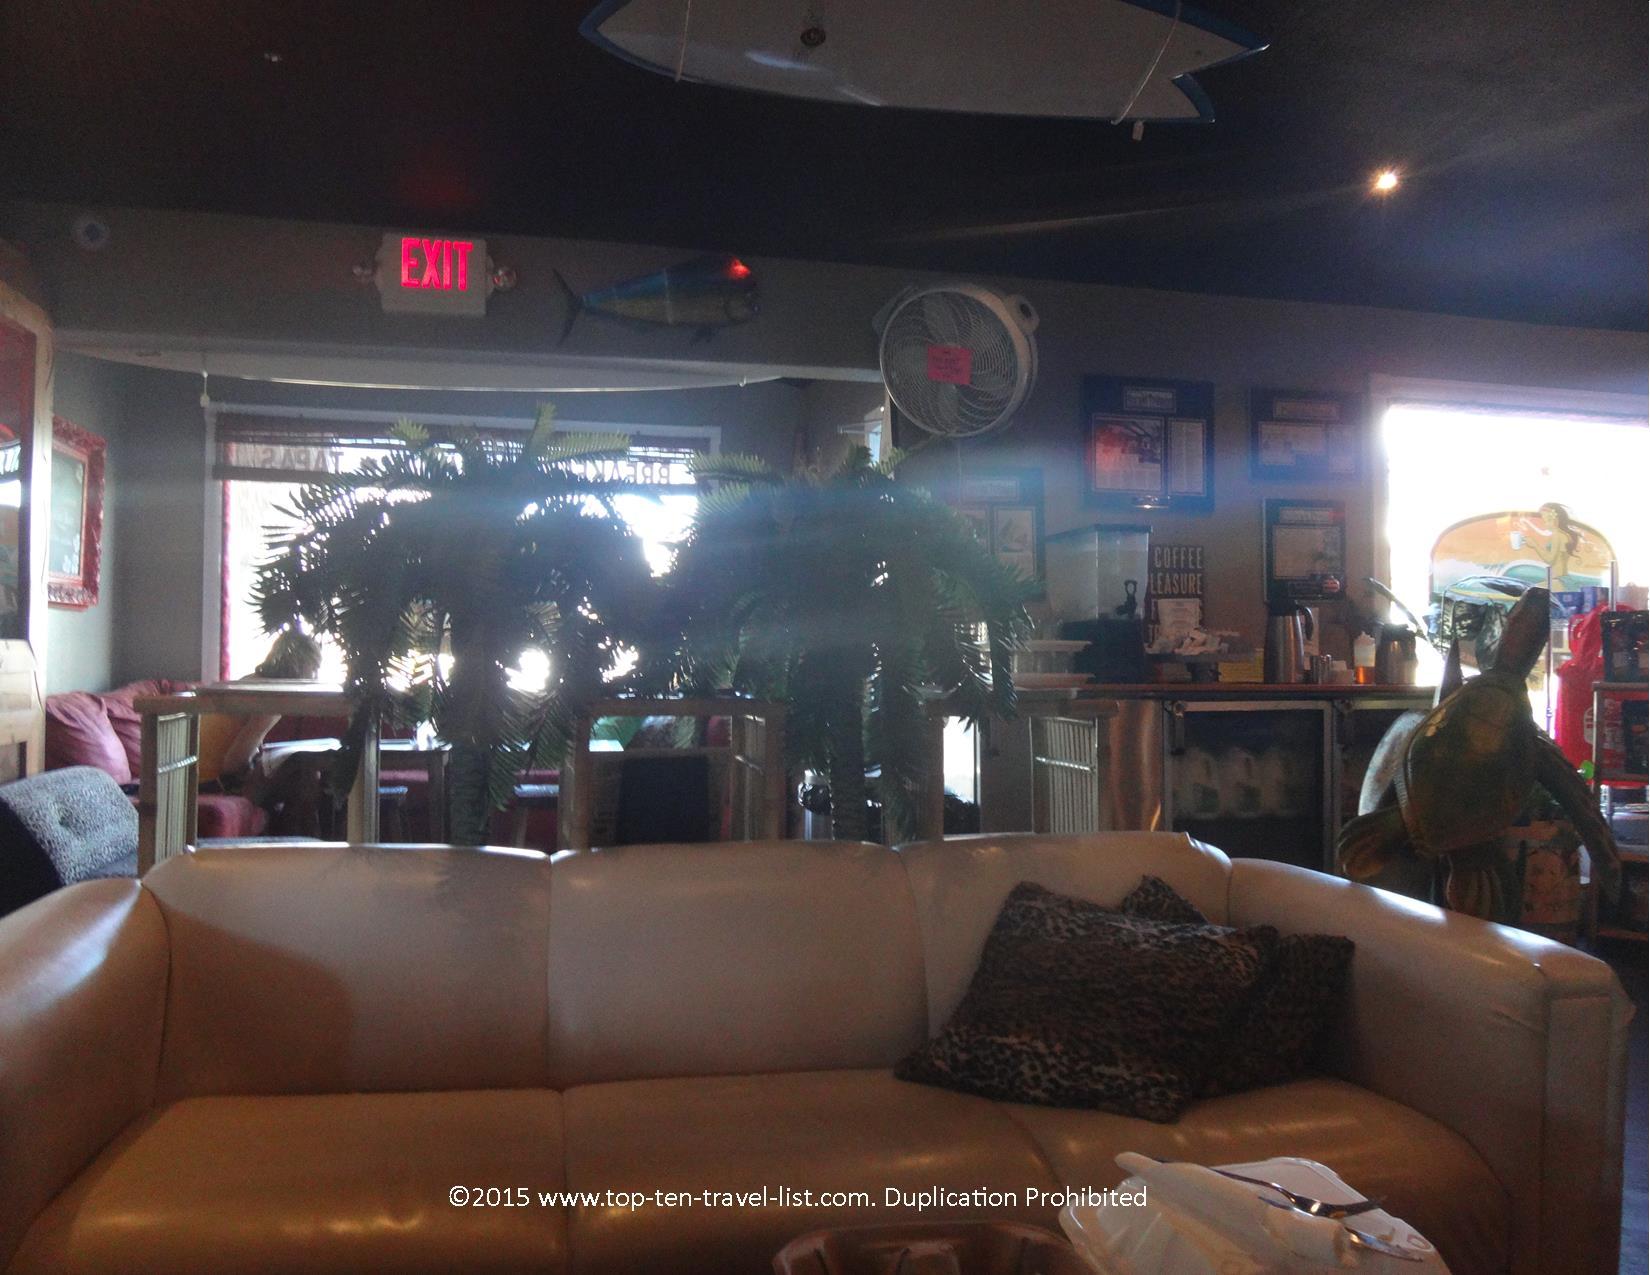 Relaxed vibe of the Lelu Coffee Lounge in Siesta Key, Florida